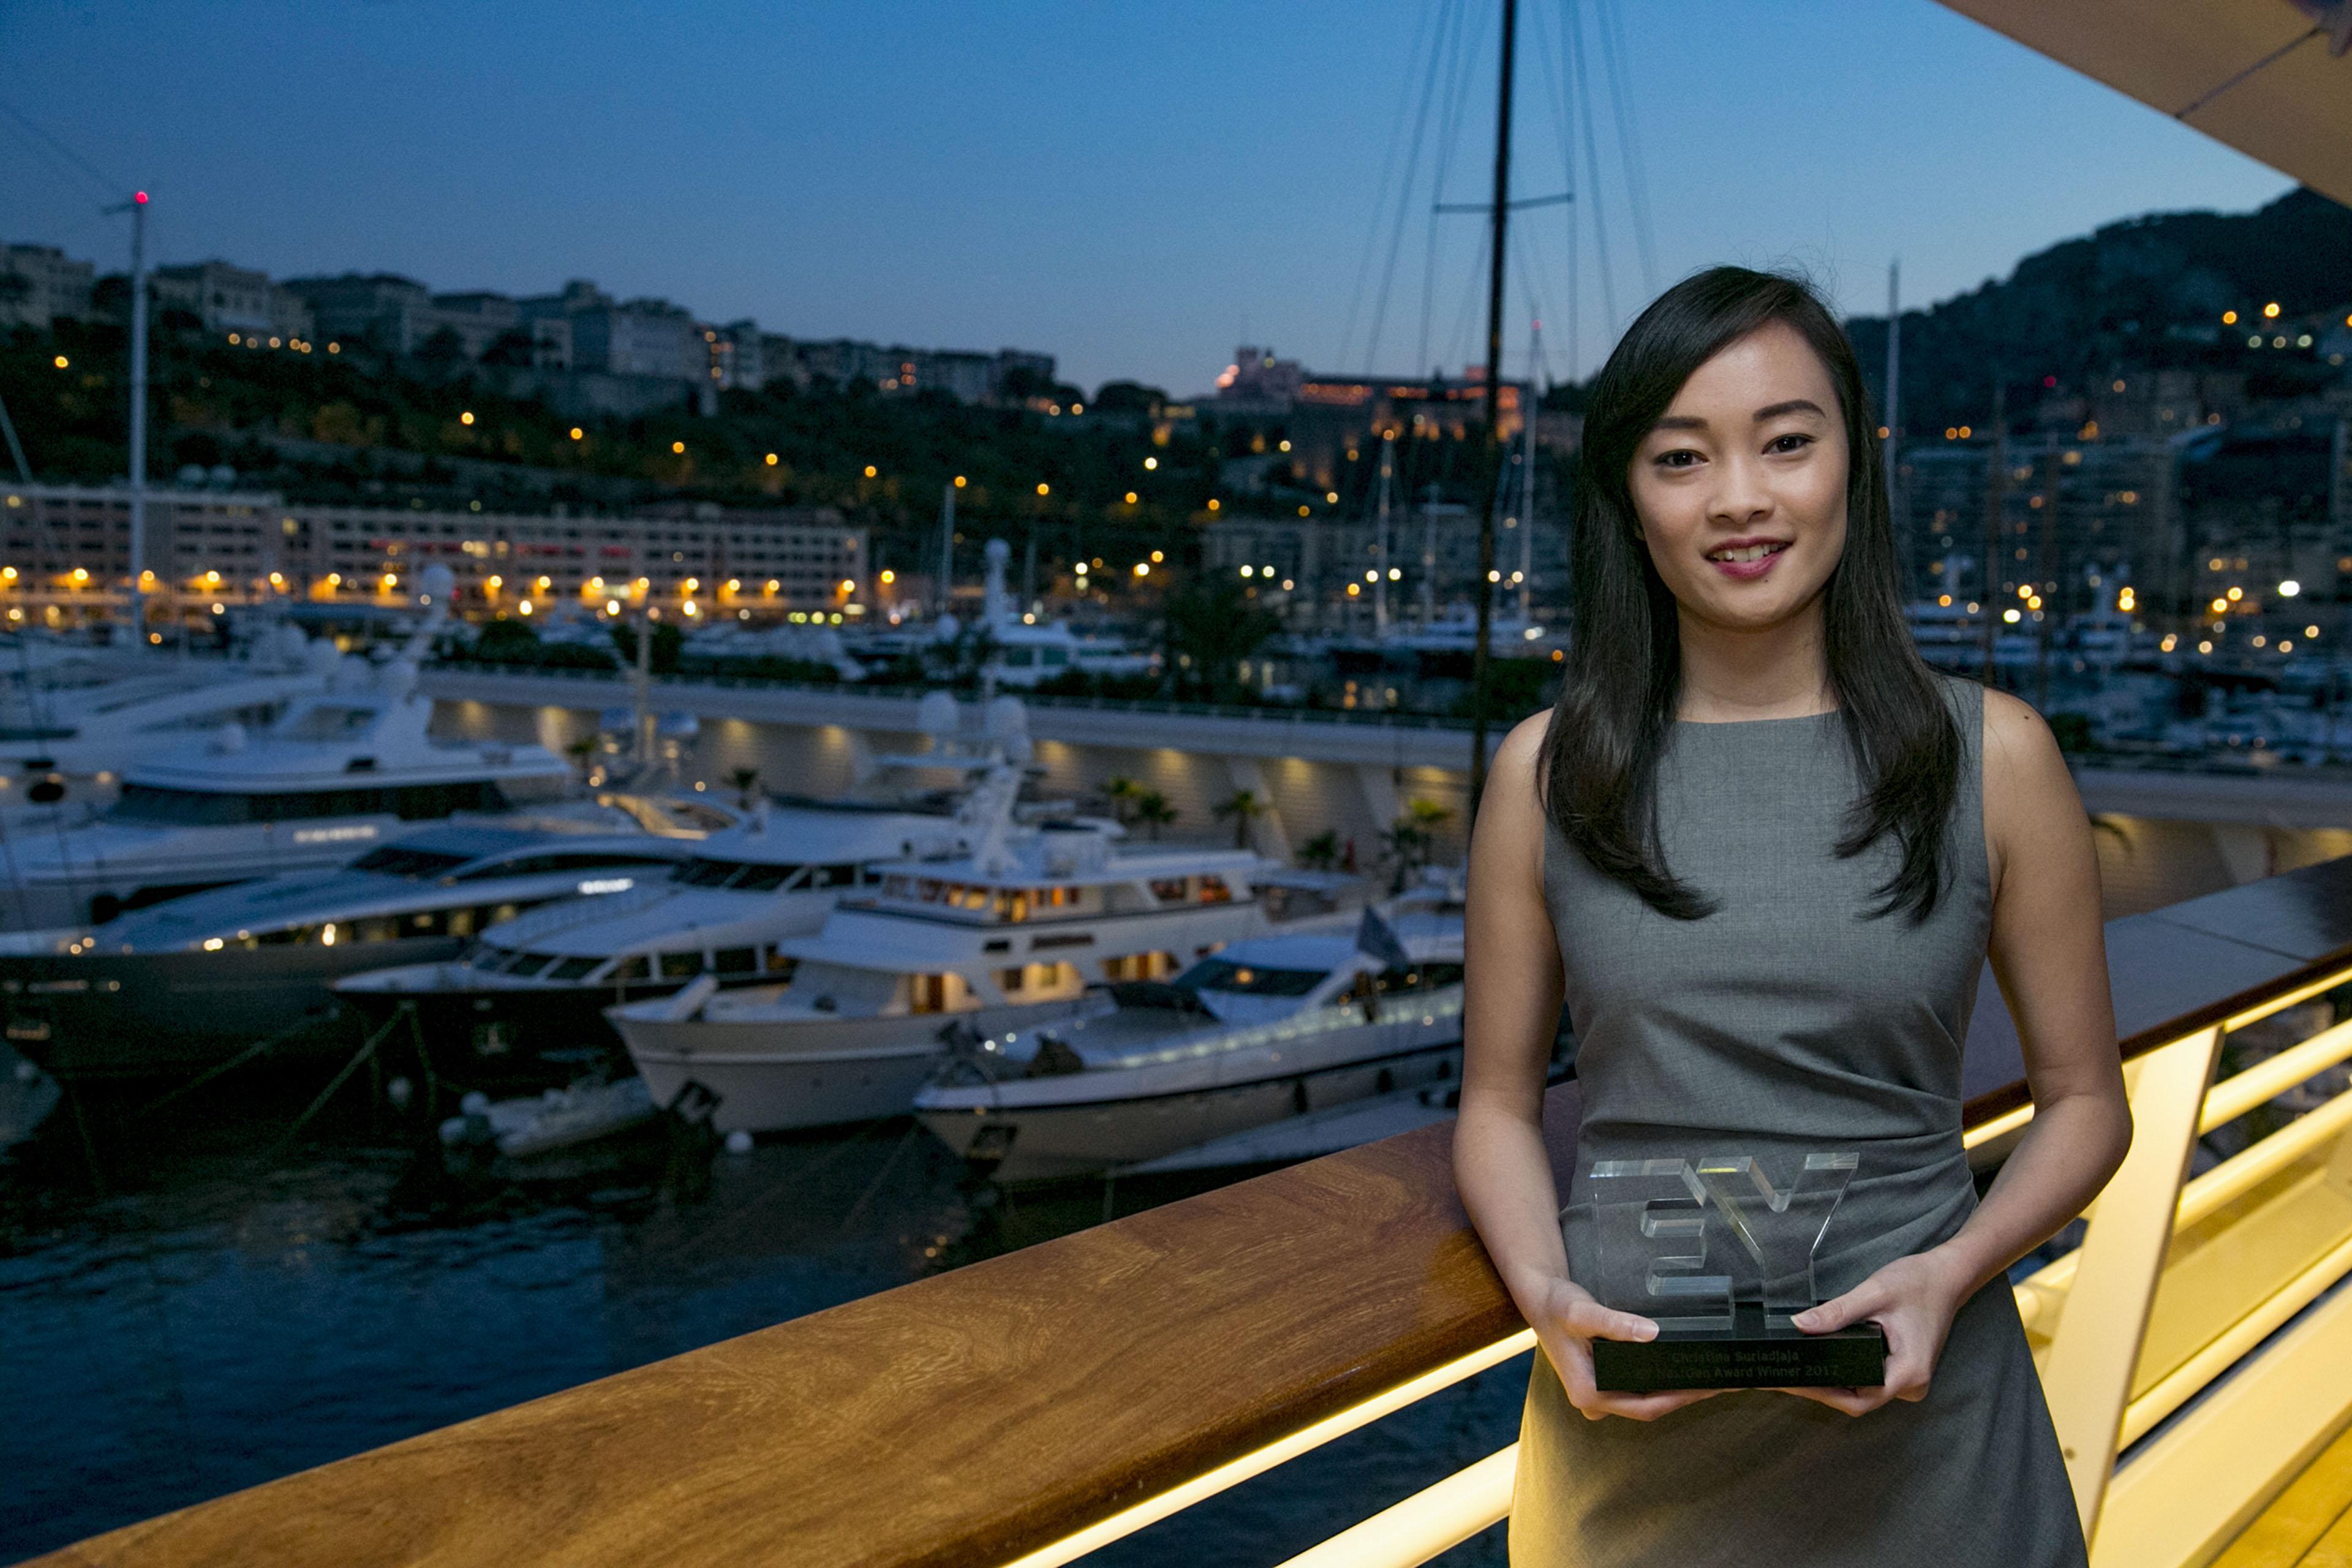 Christina Suriadjaja NextGen Award winners 2017